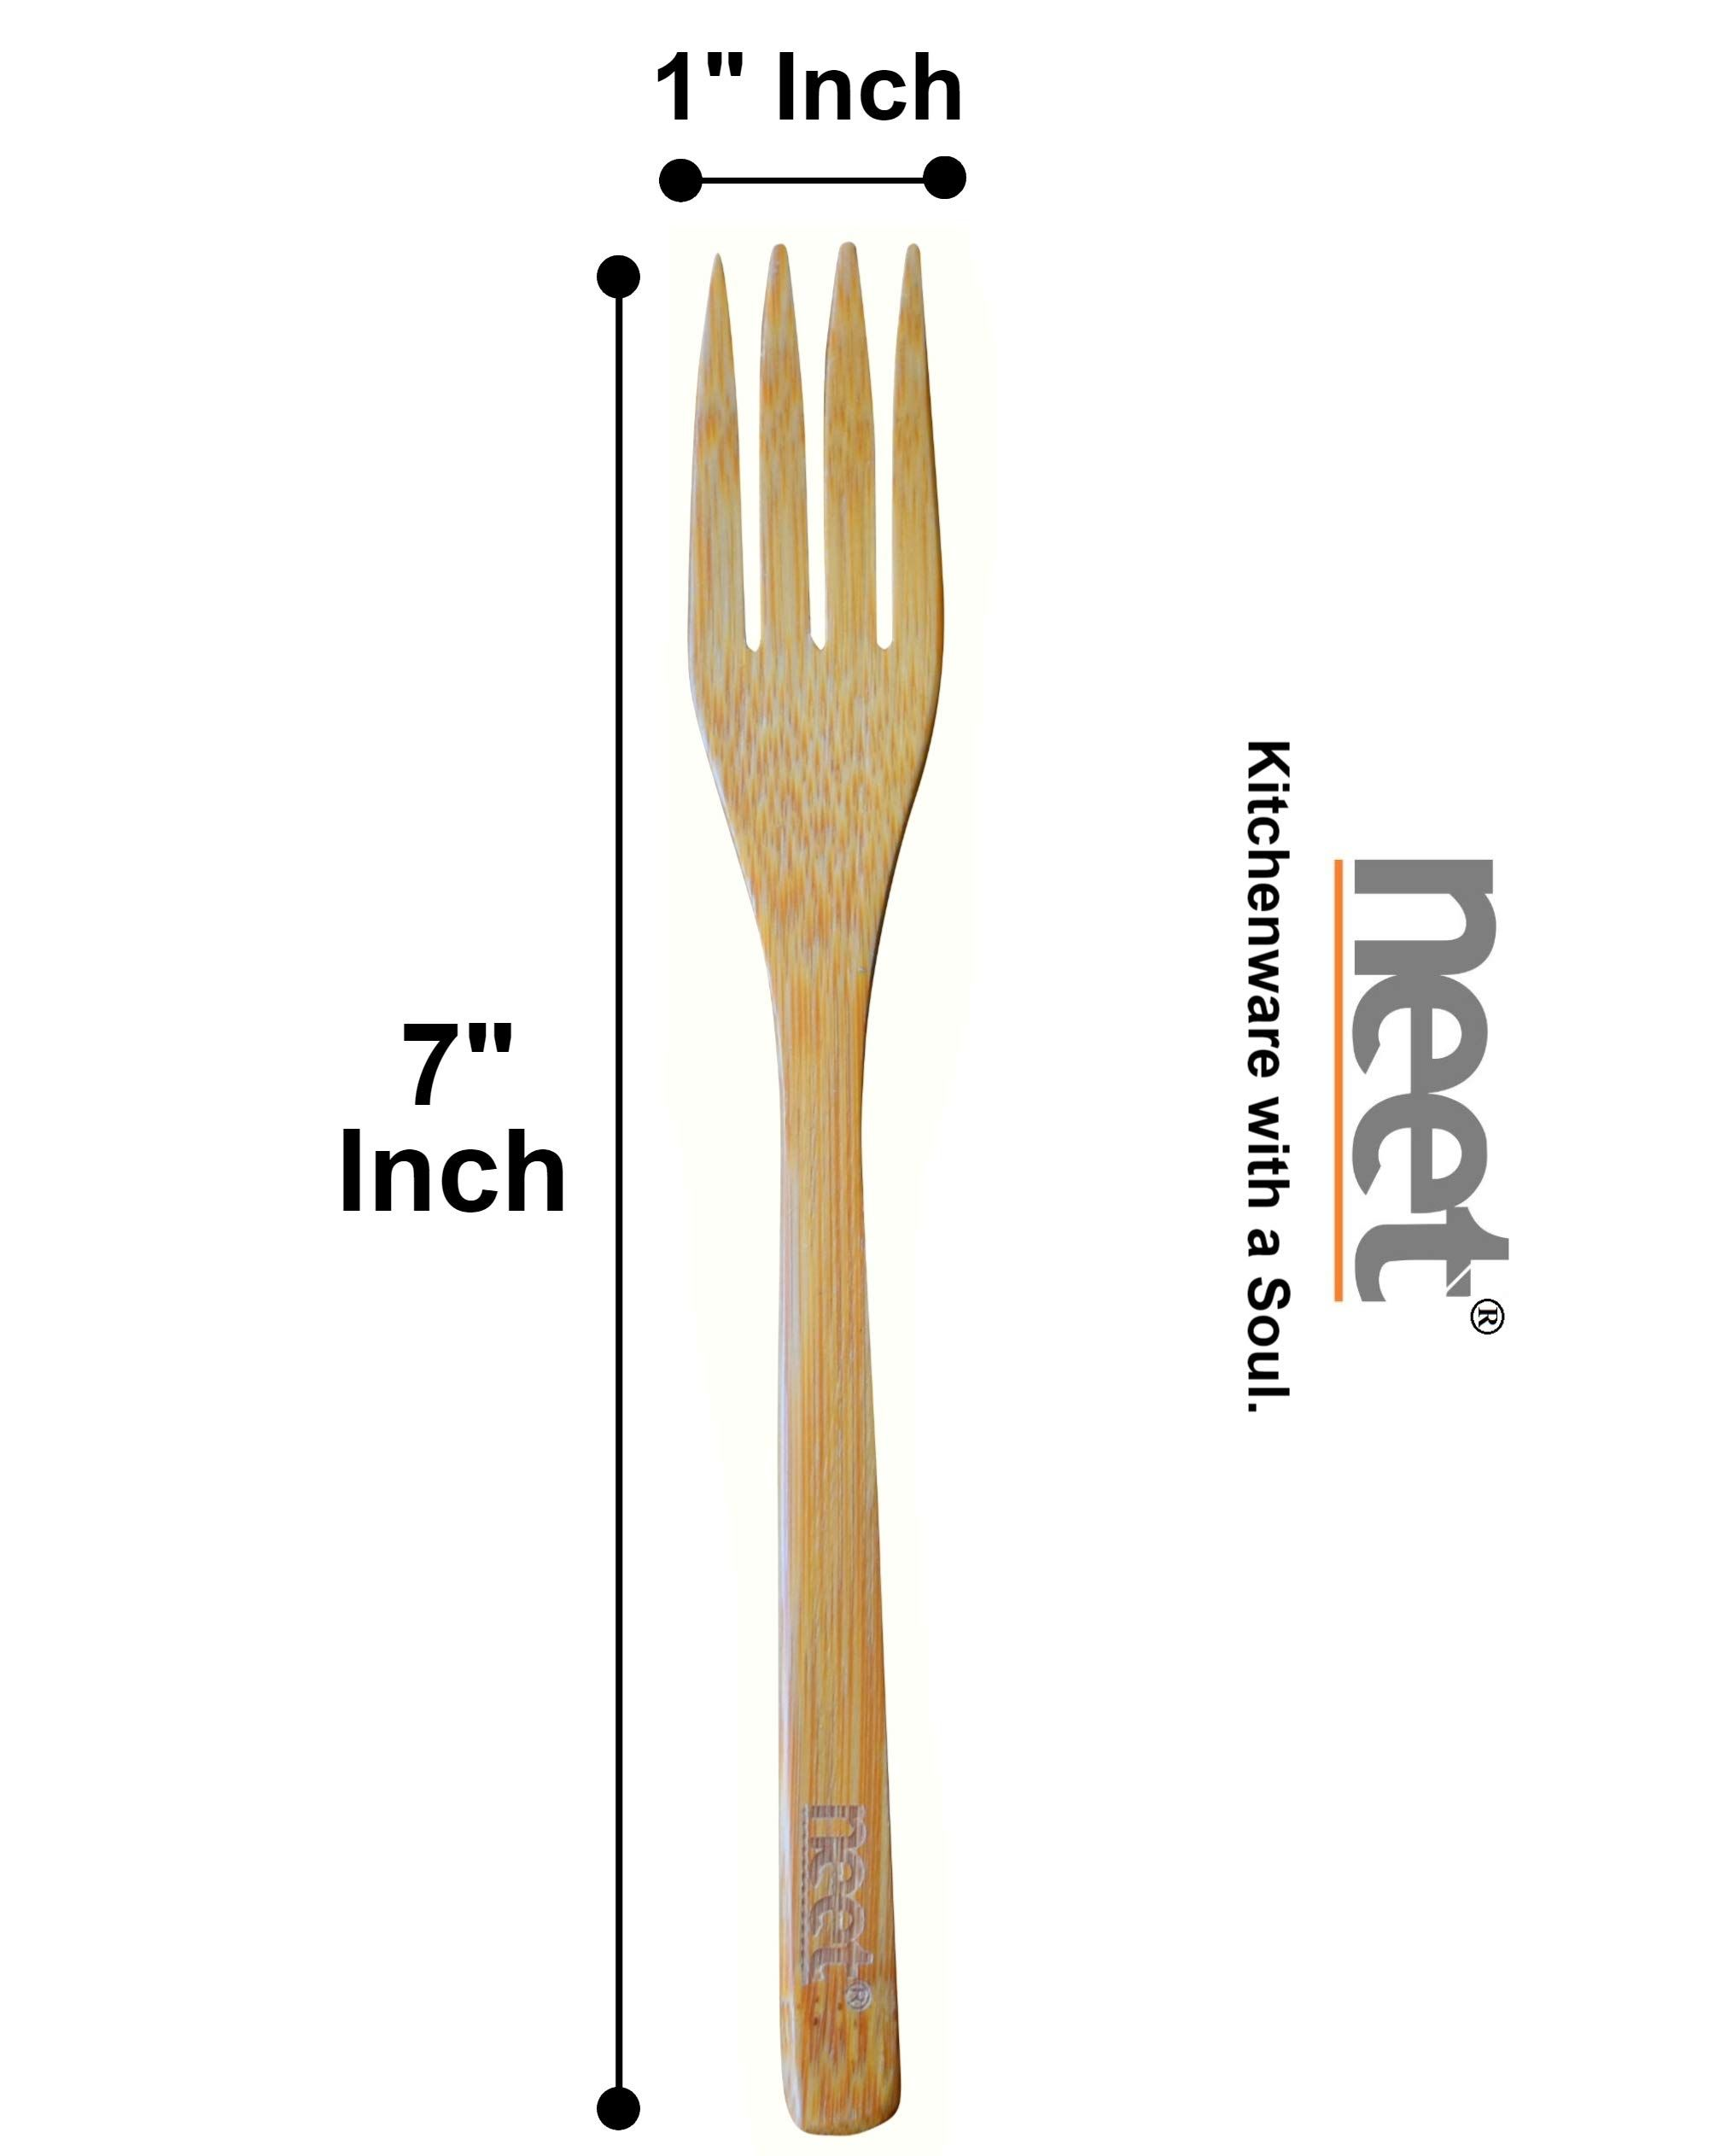 Reusable Wooden Forks 12 Piece Set For Eating Bamboo Fork Dinning Flatware Eco Friendly Tableware Kitchen Utensil Wood Utensils Kitchen Utensils Wooden Fork